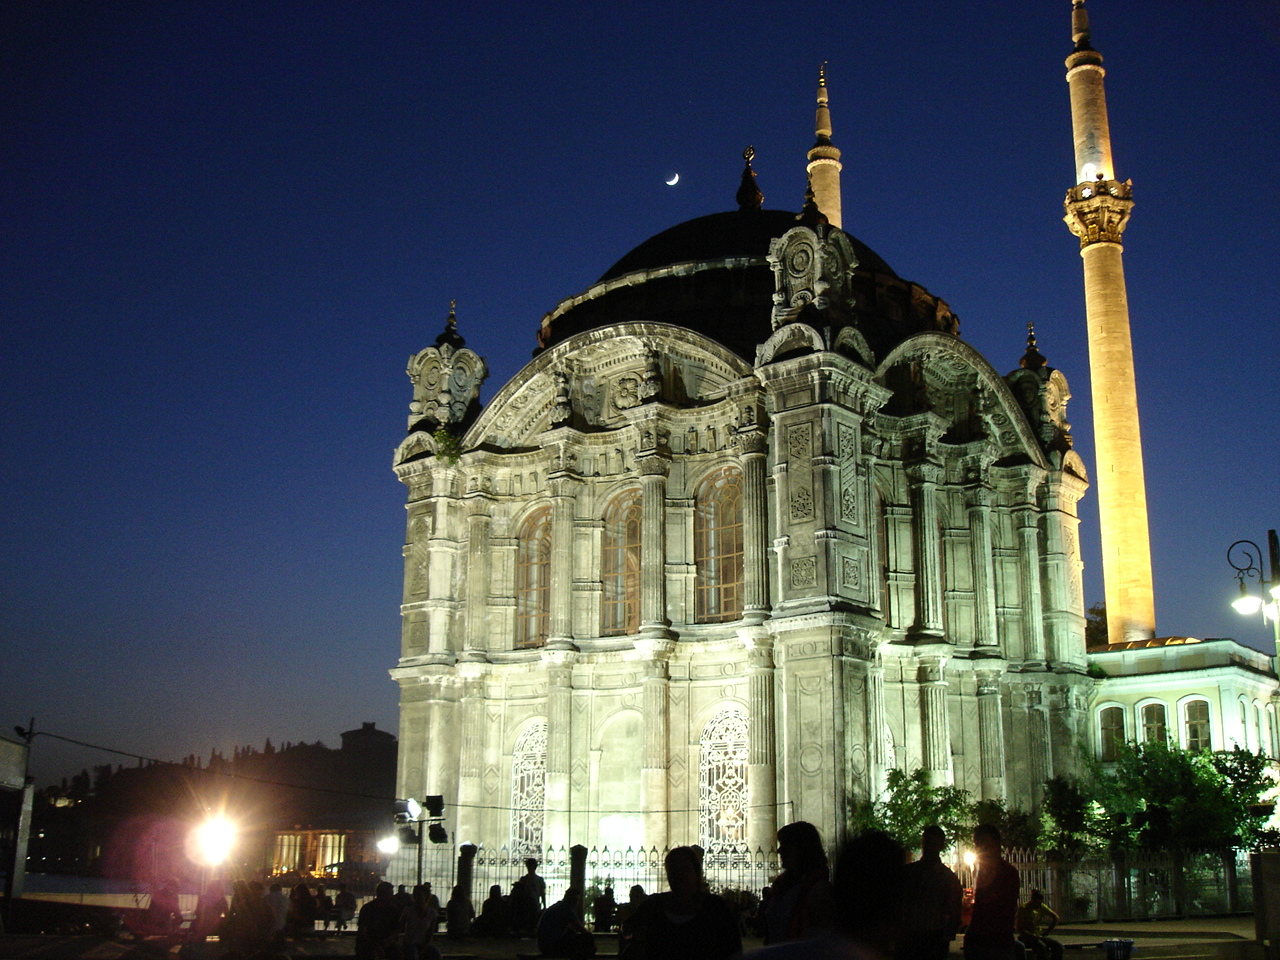 The Ortaköy Mosque, designed by Garabed and Nigoghayos Balyan, 1850s